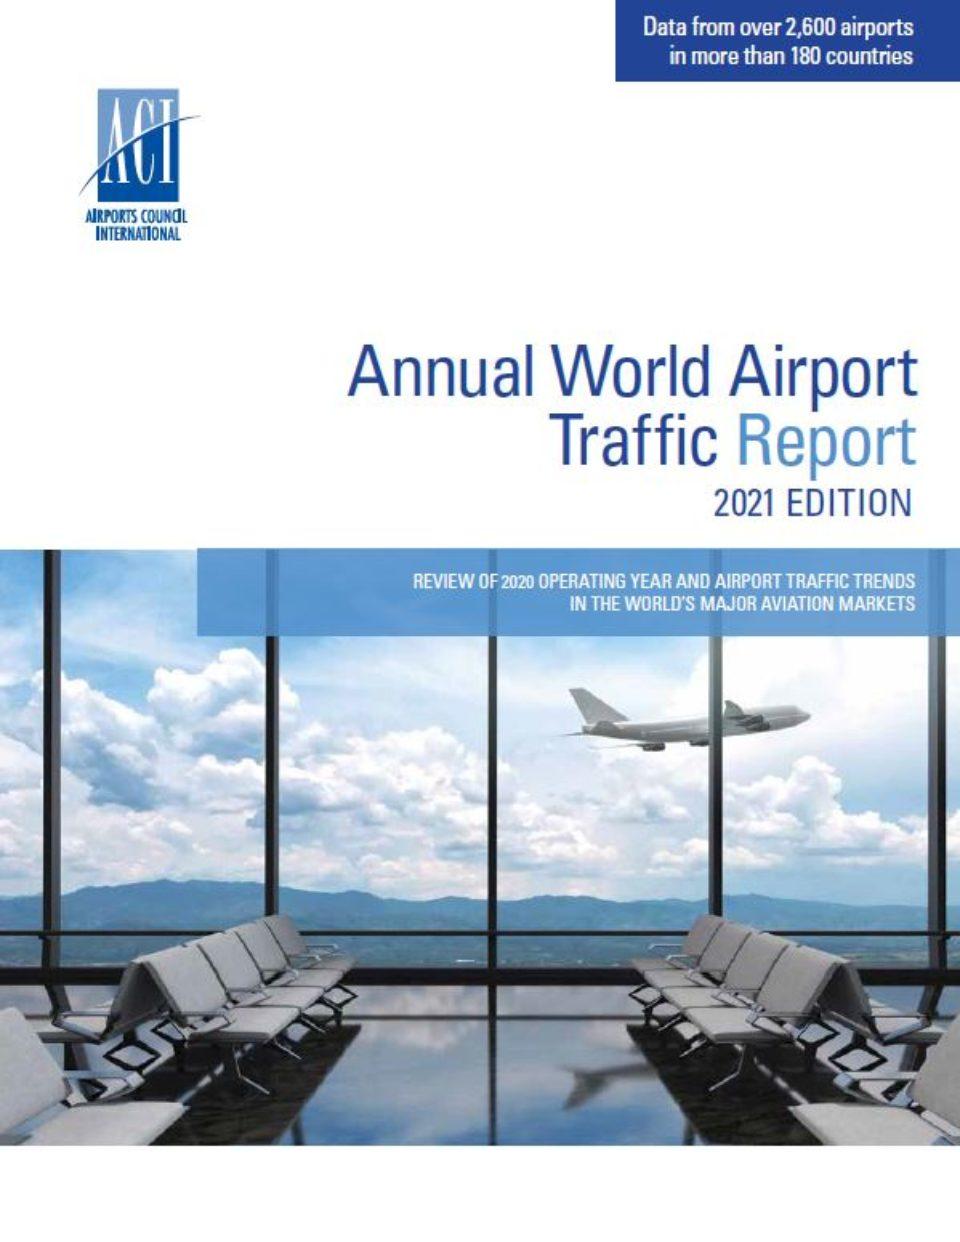 Annual World Airport Traffic Reports (WATR)